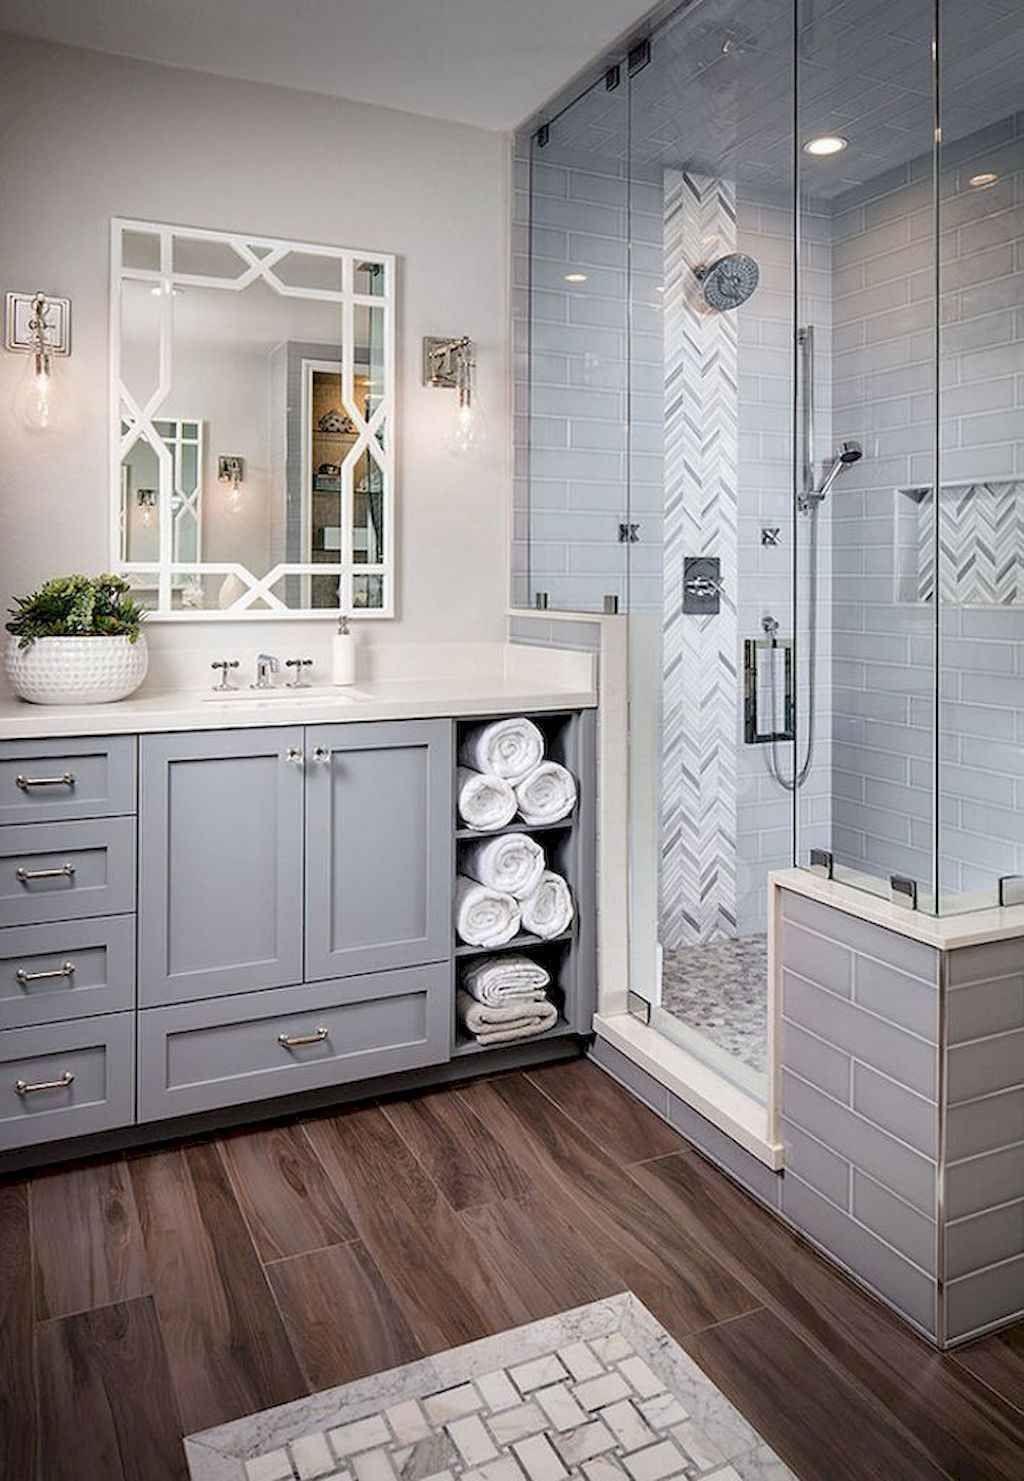 80 Cool Farmhouse Tile Shower Ideas Remodel (64 | Modern ...